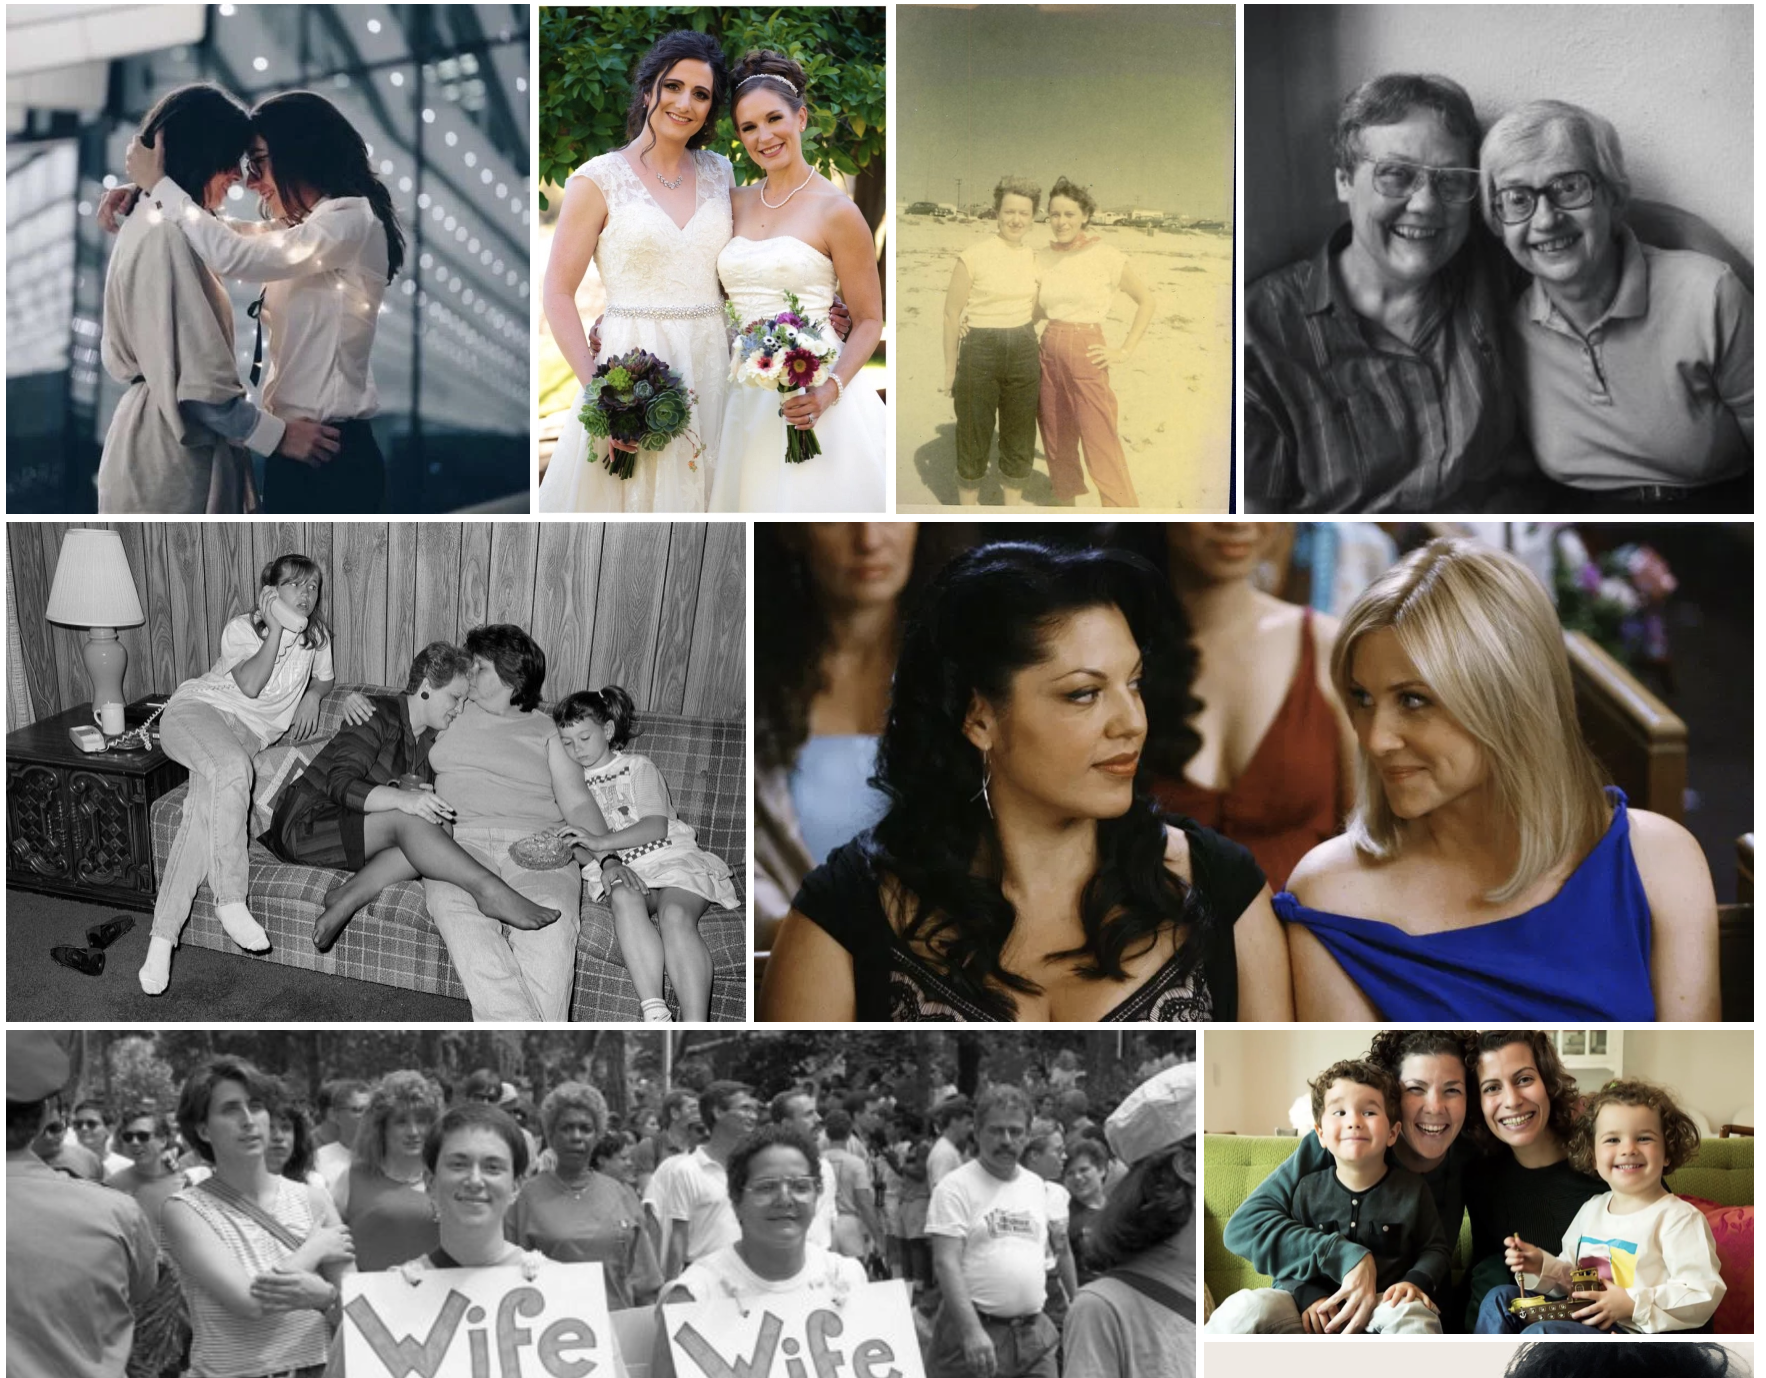 dia das namoradas casal lésbico mulher lésbica amor LGBTI galeria